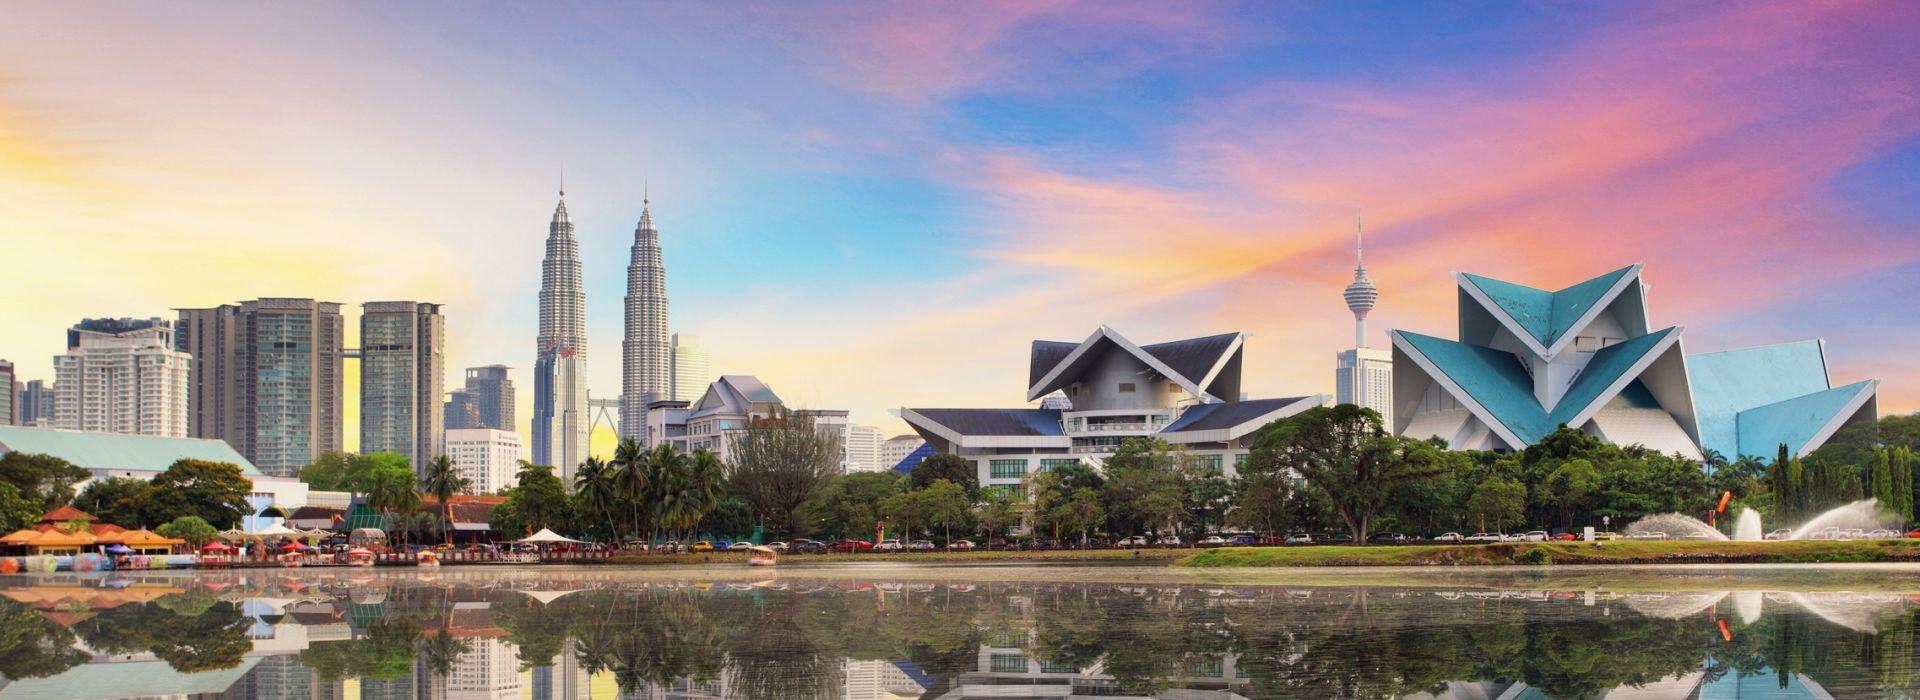 Adventure and sport activities Tours in Kuala Lumpur